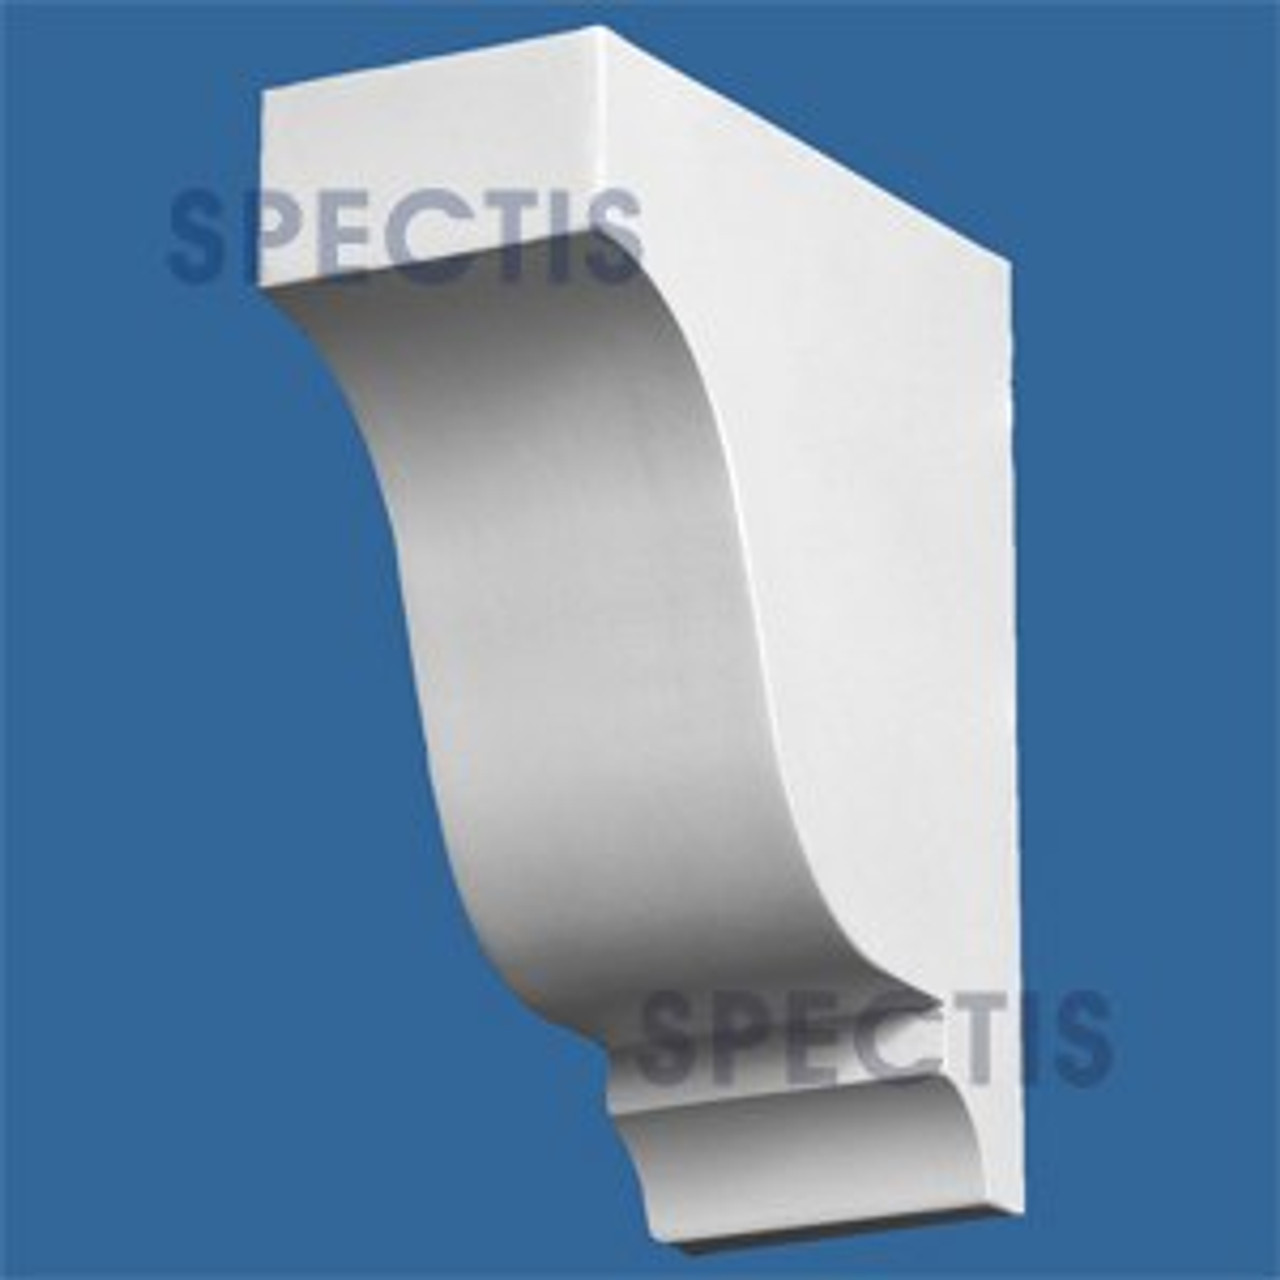 "BL2878 Corbel Block or Eave Bracket 2.25""W x 5.9""H x 5"" P"